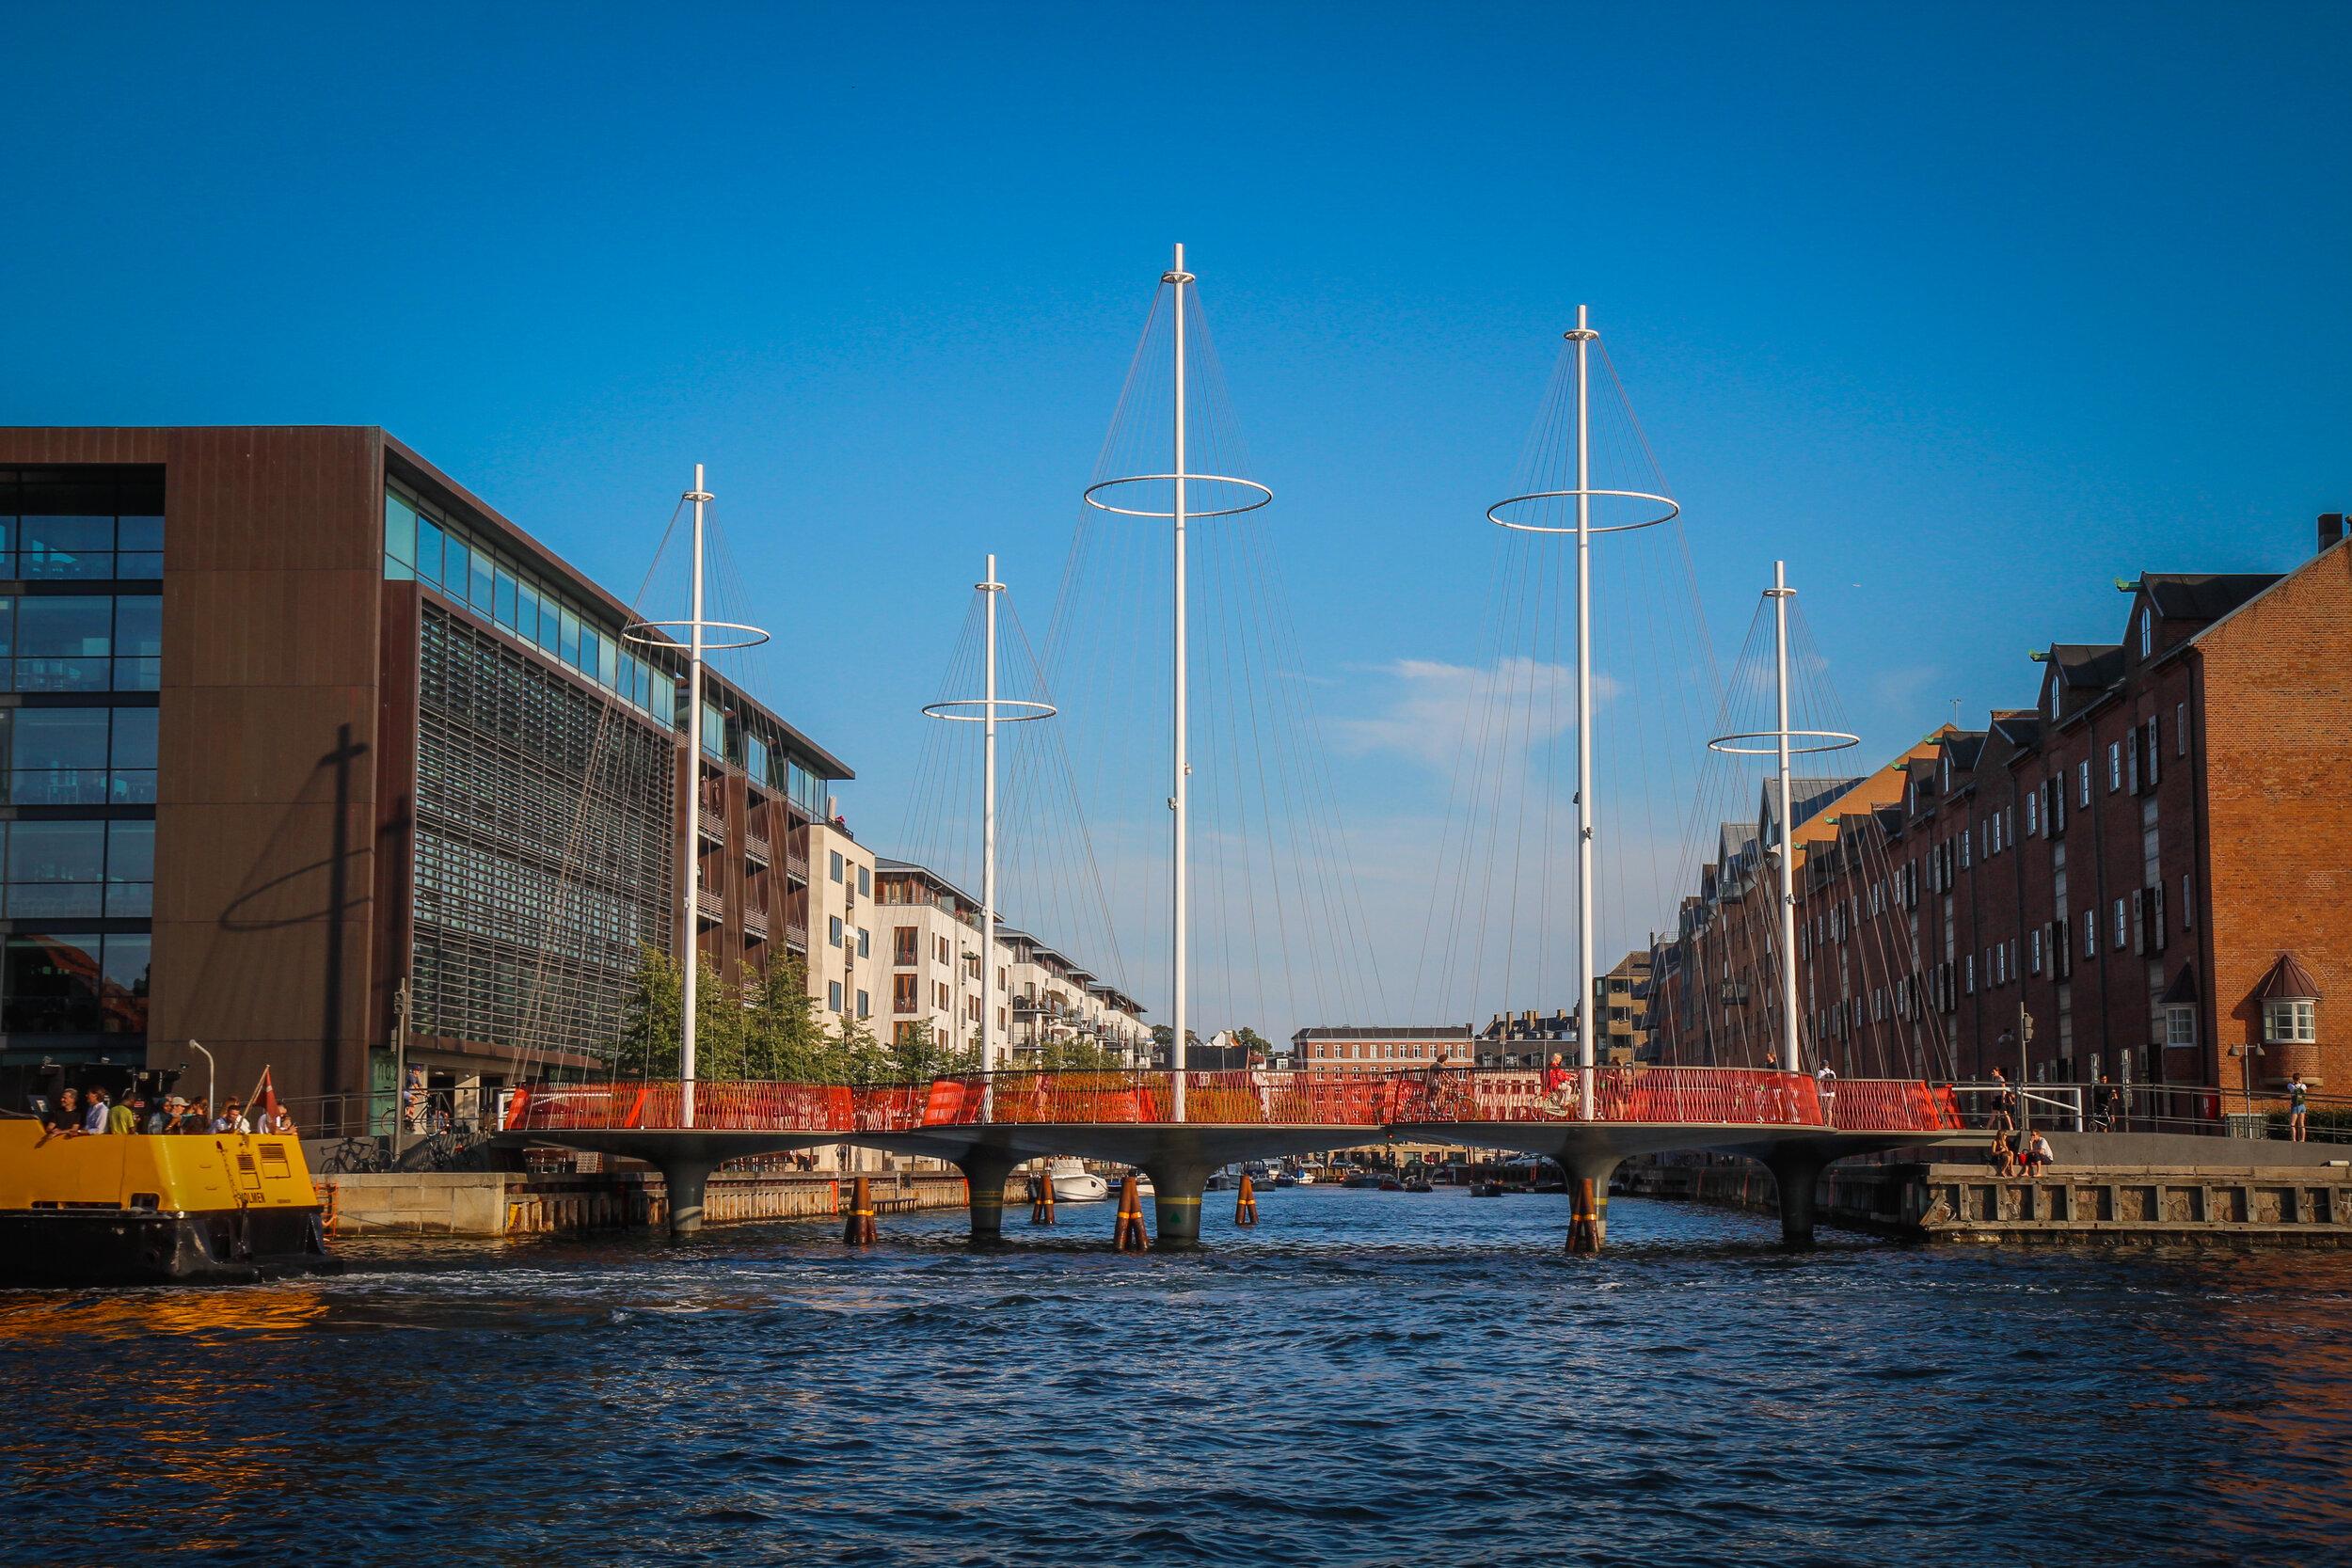 Kopenhagen_denemarken_Tui-74.jpg